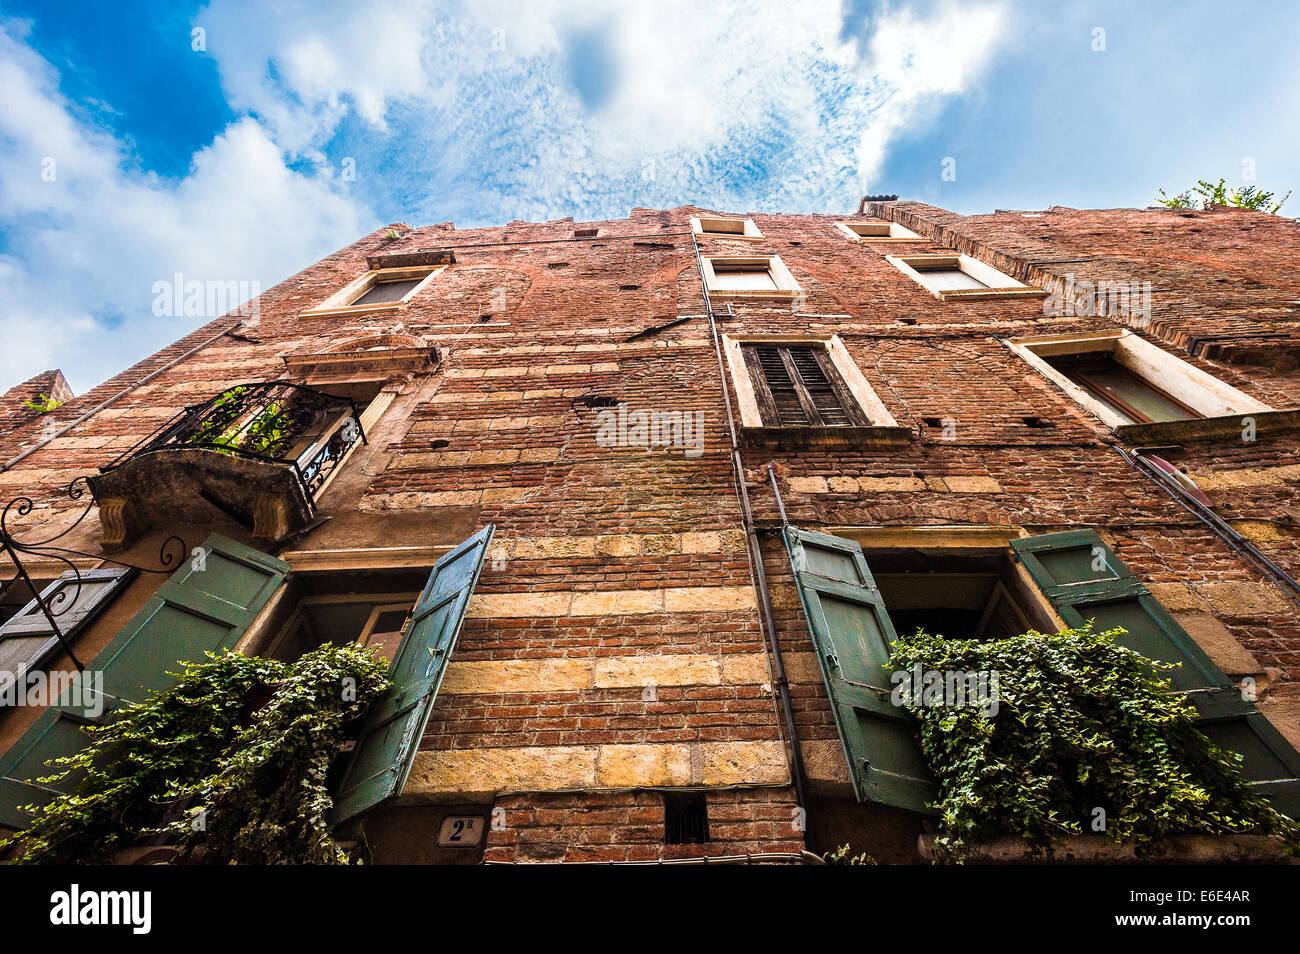 Italien-Veneto-Verona-Haus von Cagnolo Nagarola - Haus von Romeo Stockbild